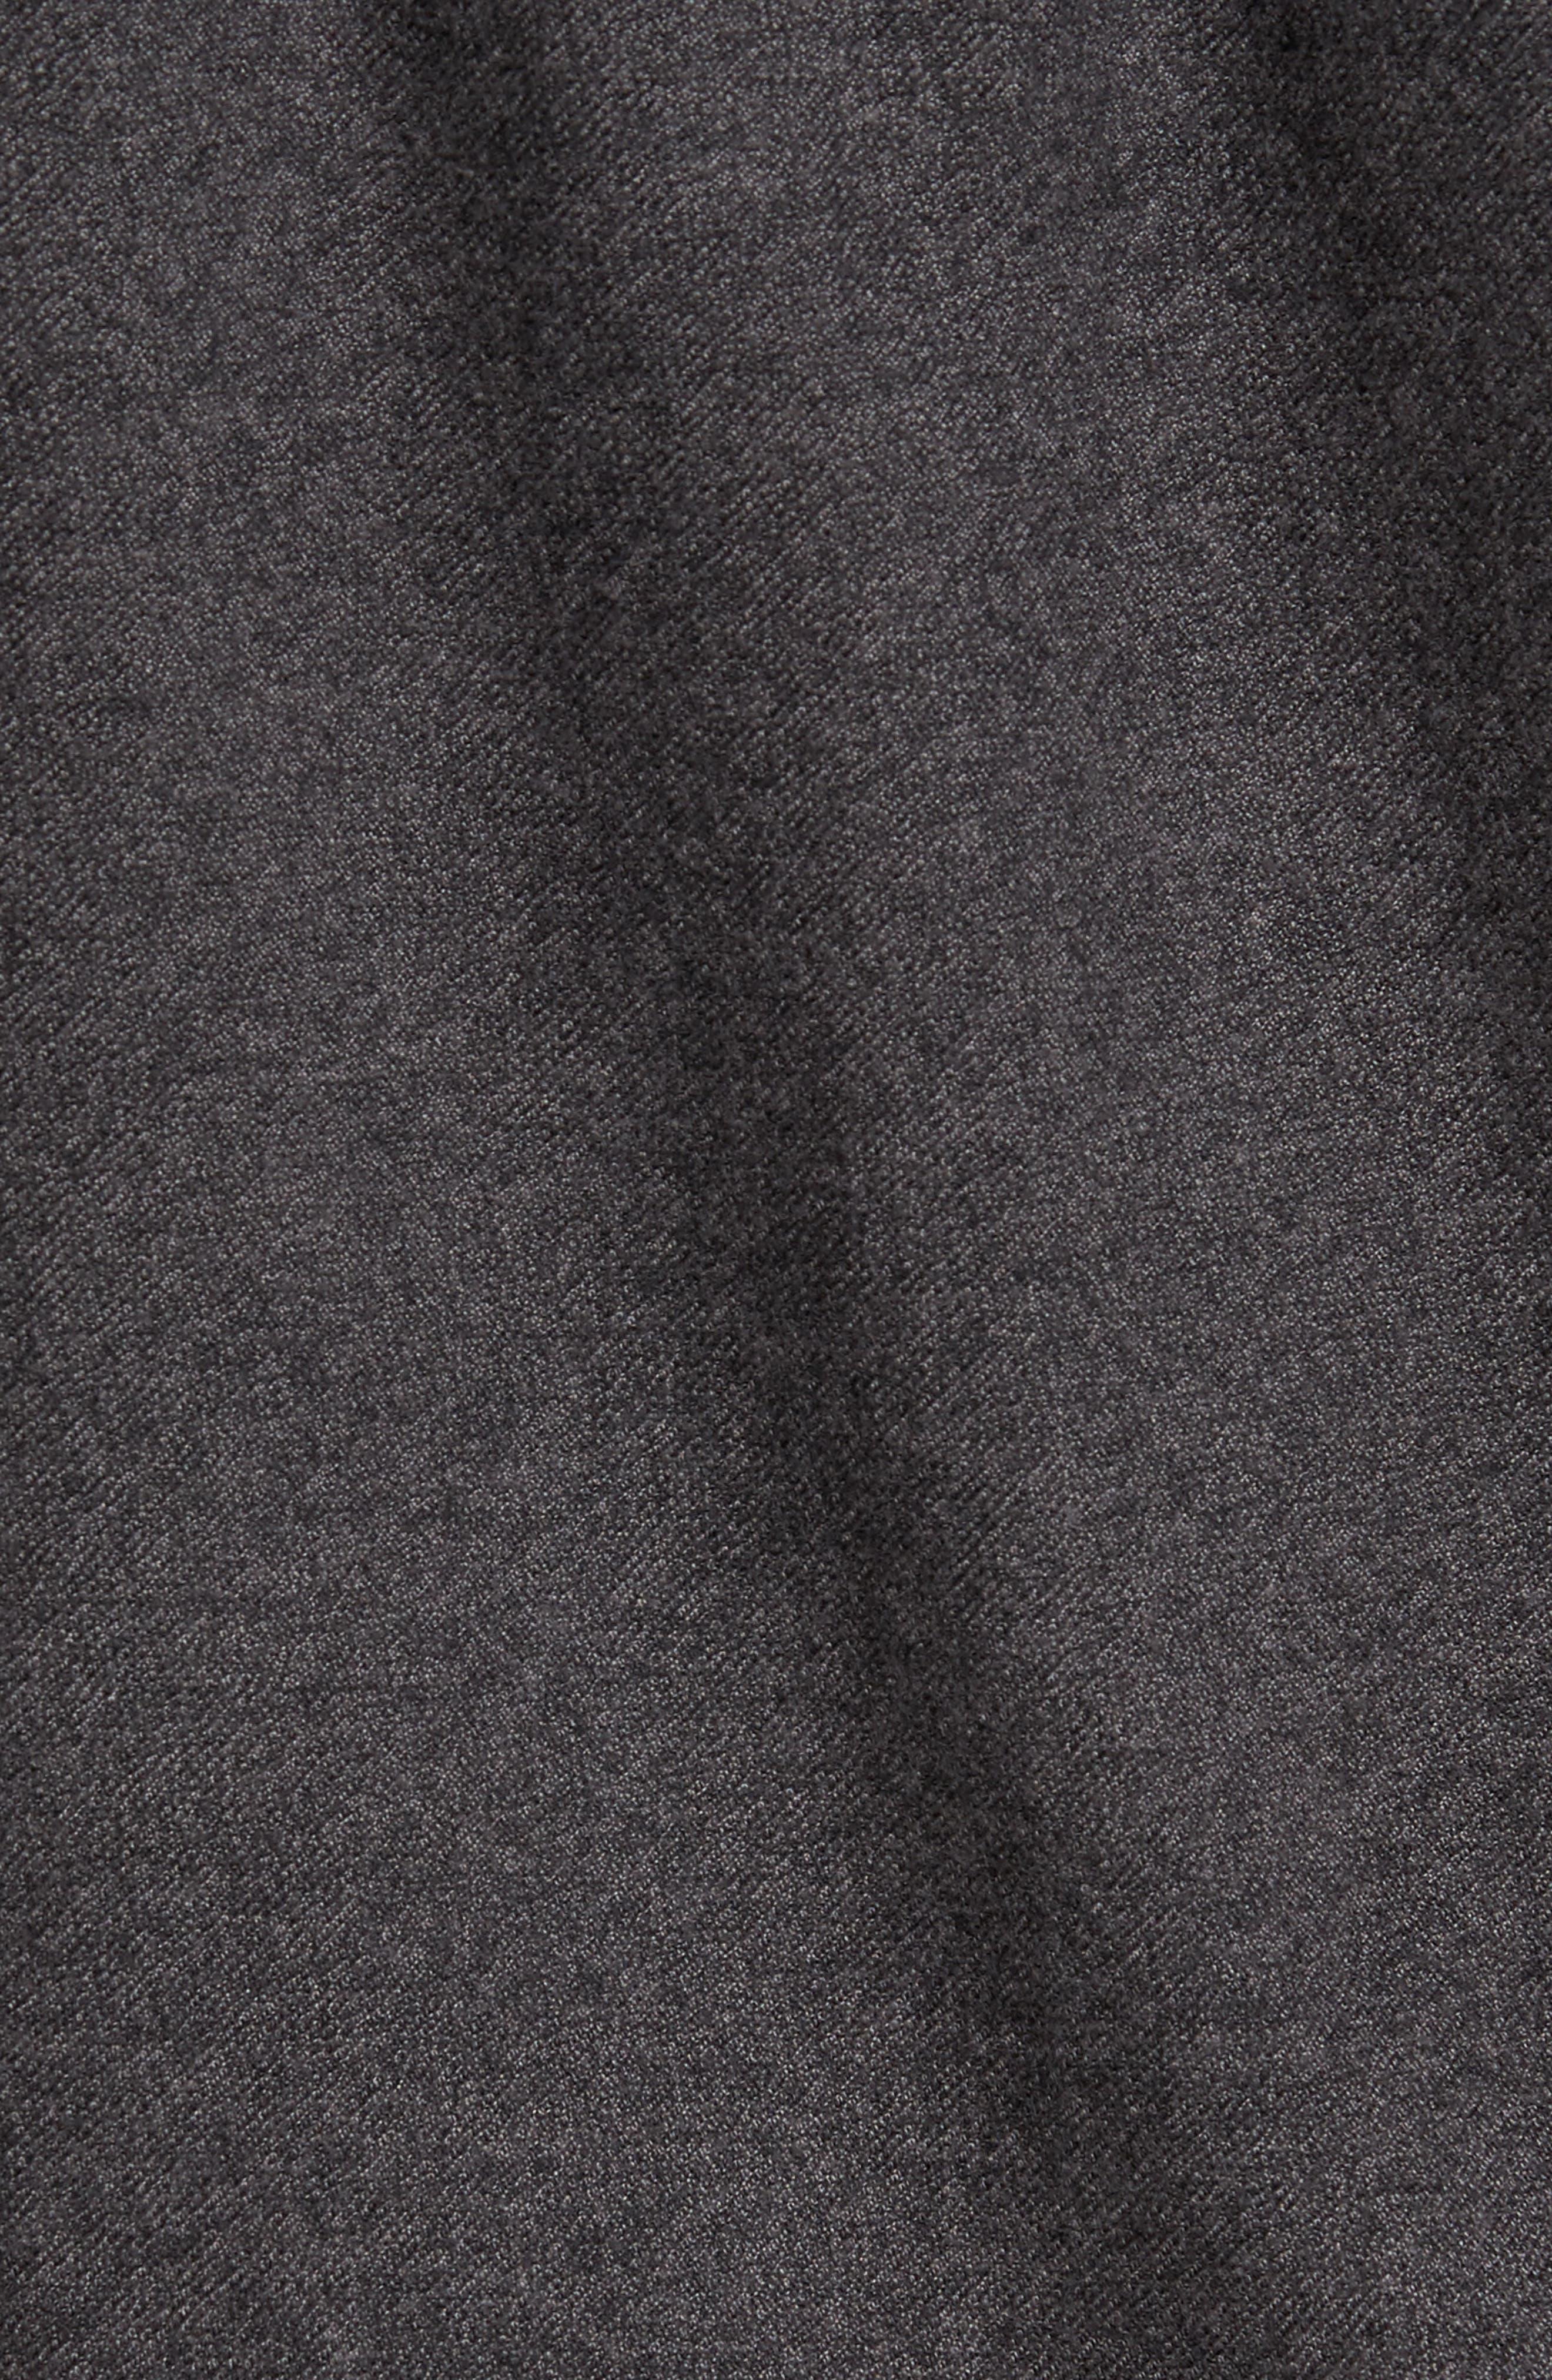 Never Mind Hooded Zip Shirt Jacket,                             Alternate thumbnail 5, color,                             001